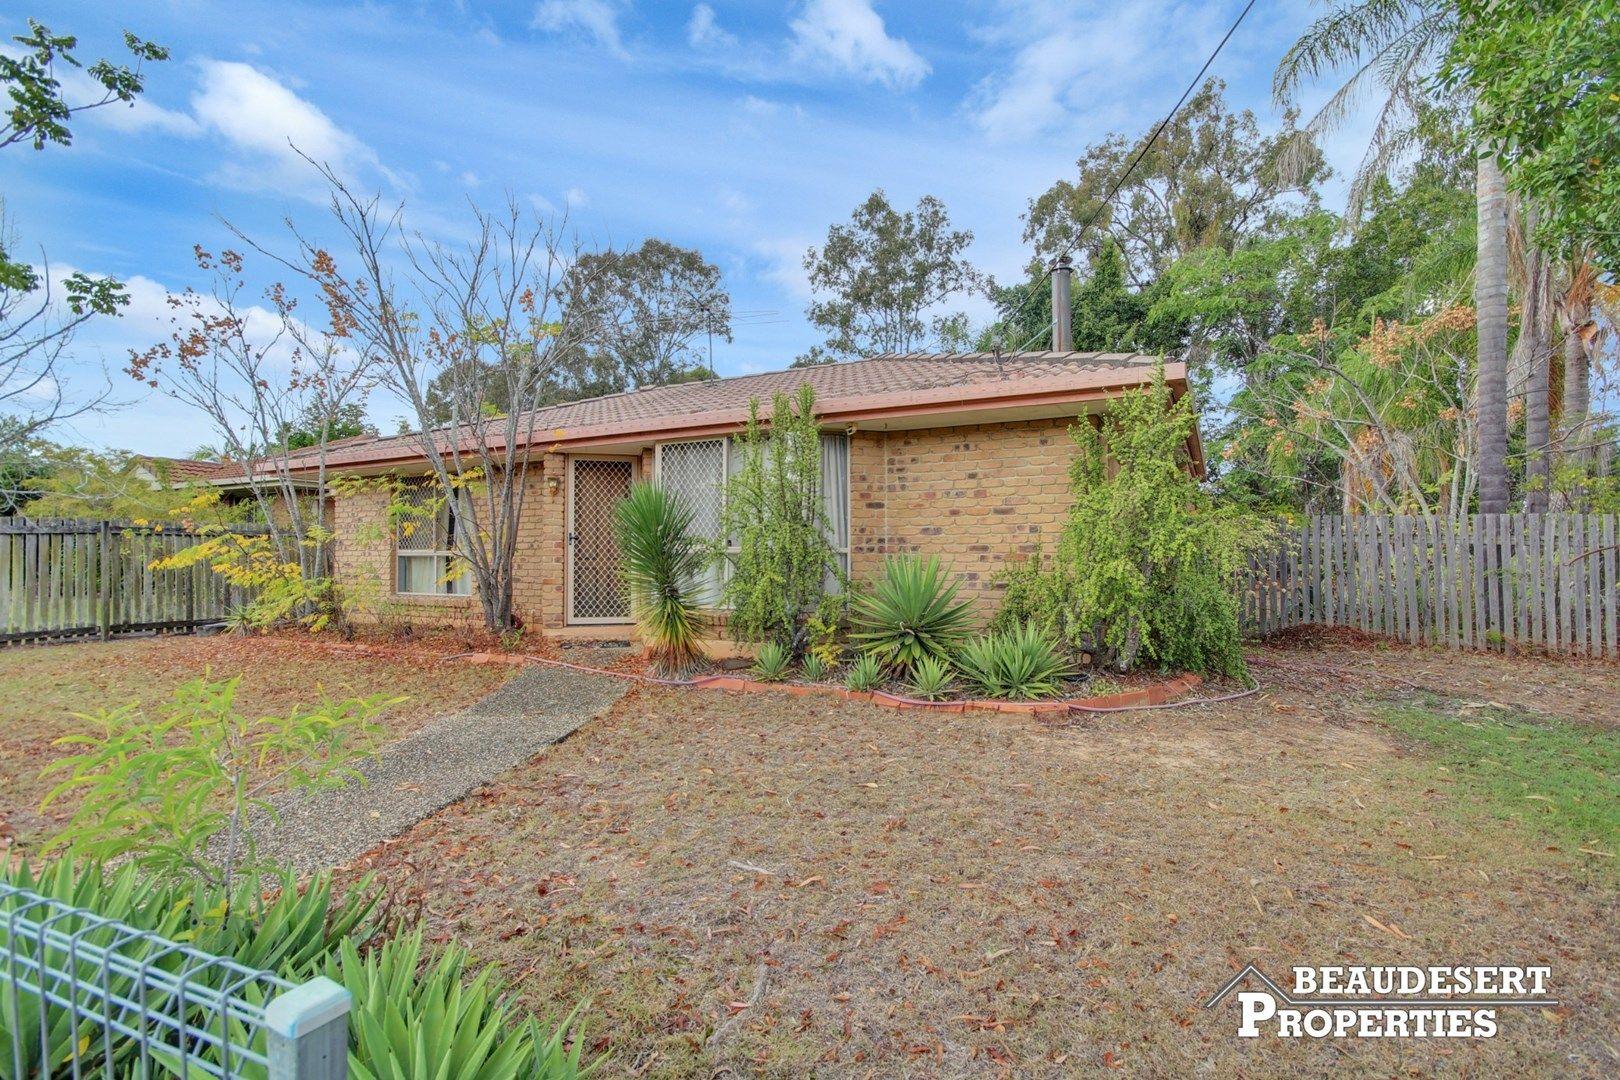 Cnr 1 Short & Merton Street, Jimboomba QLD 4280, Image 0